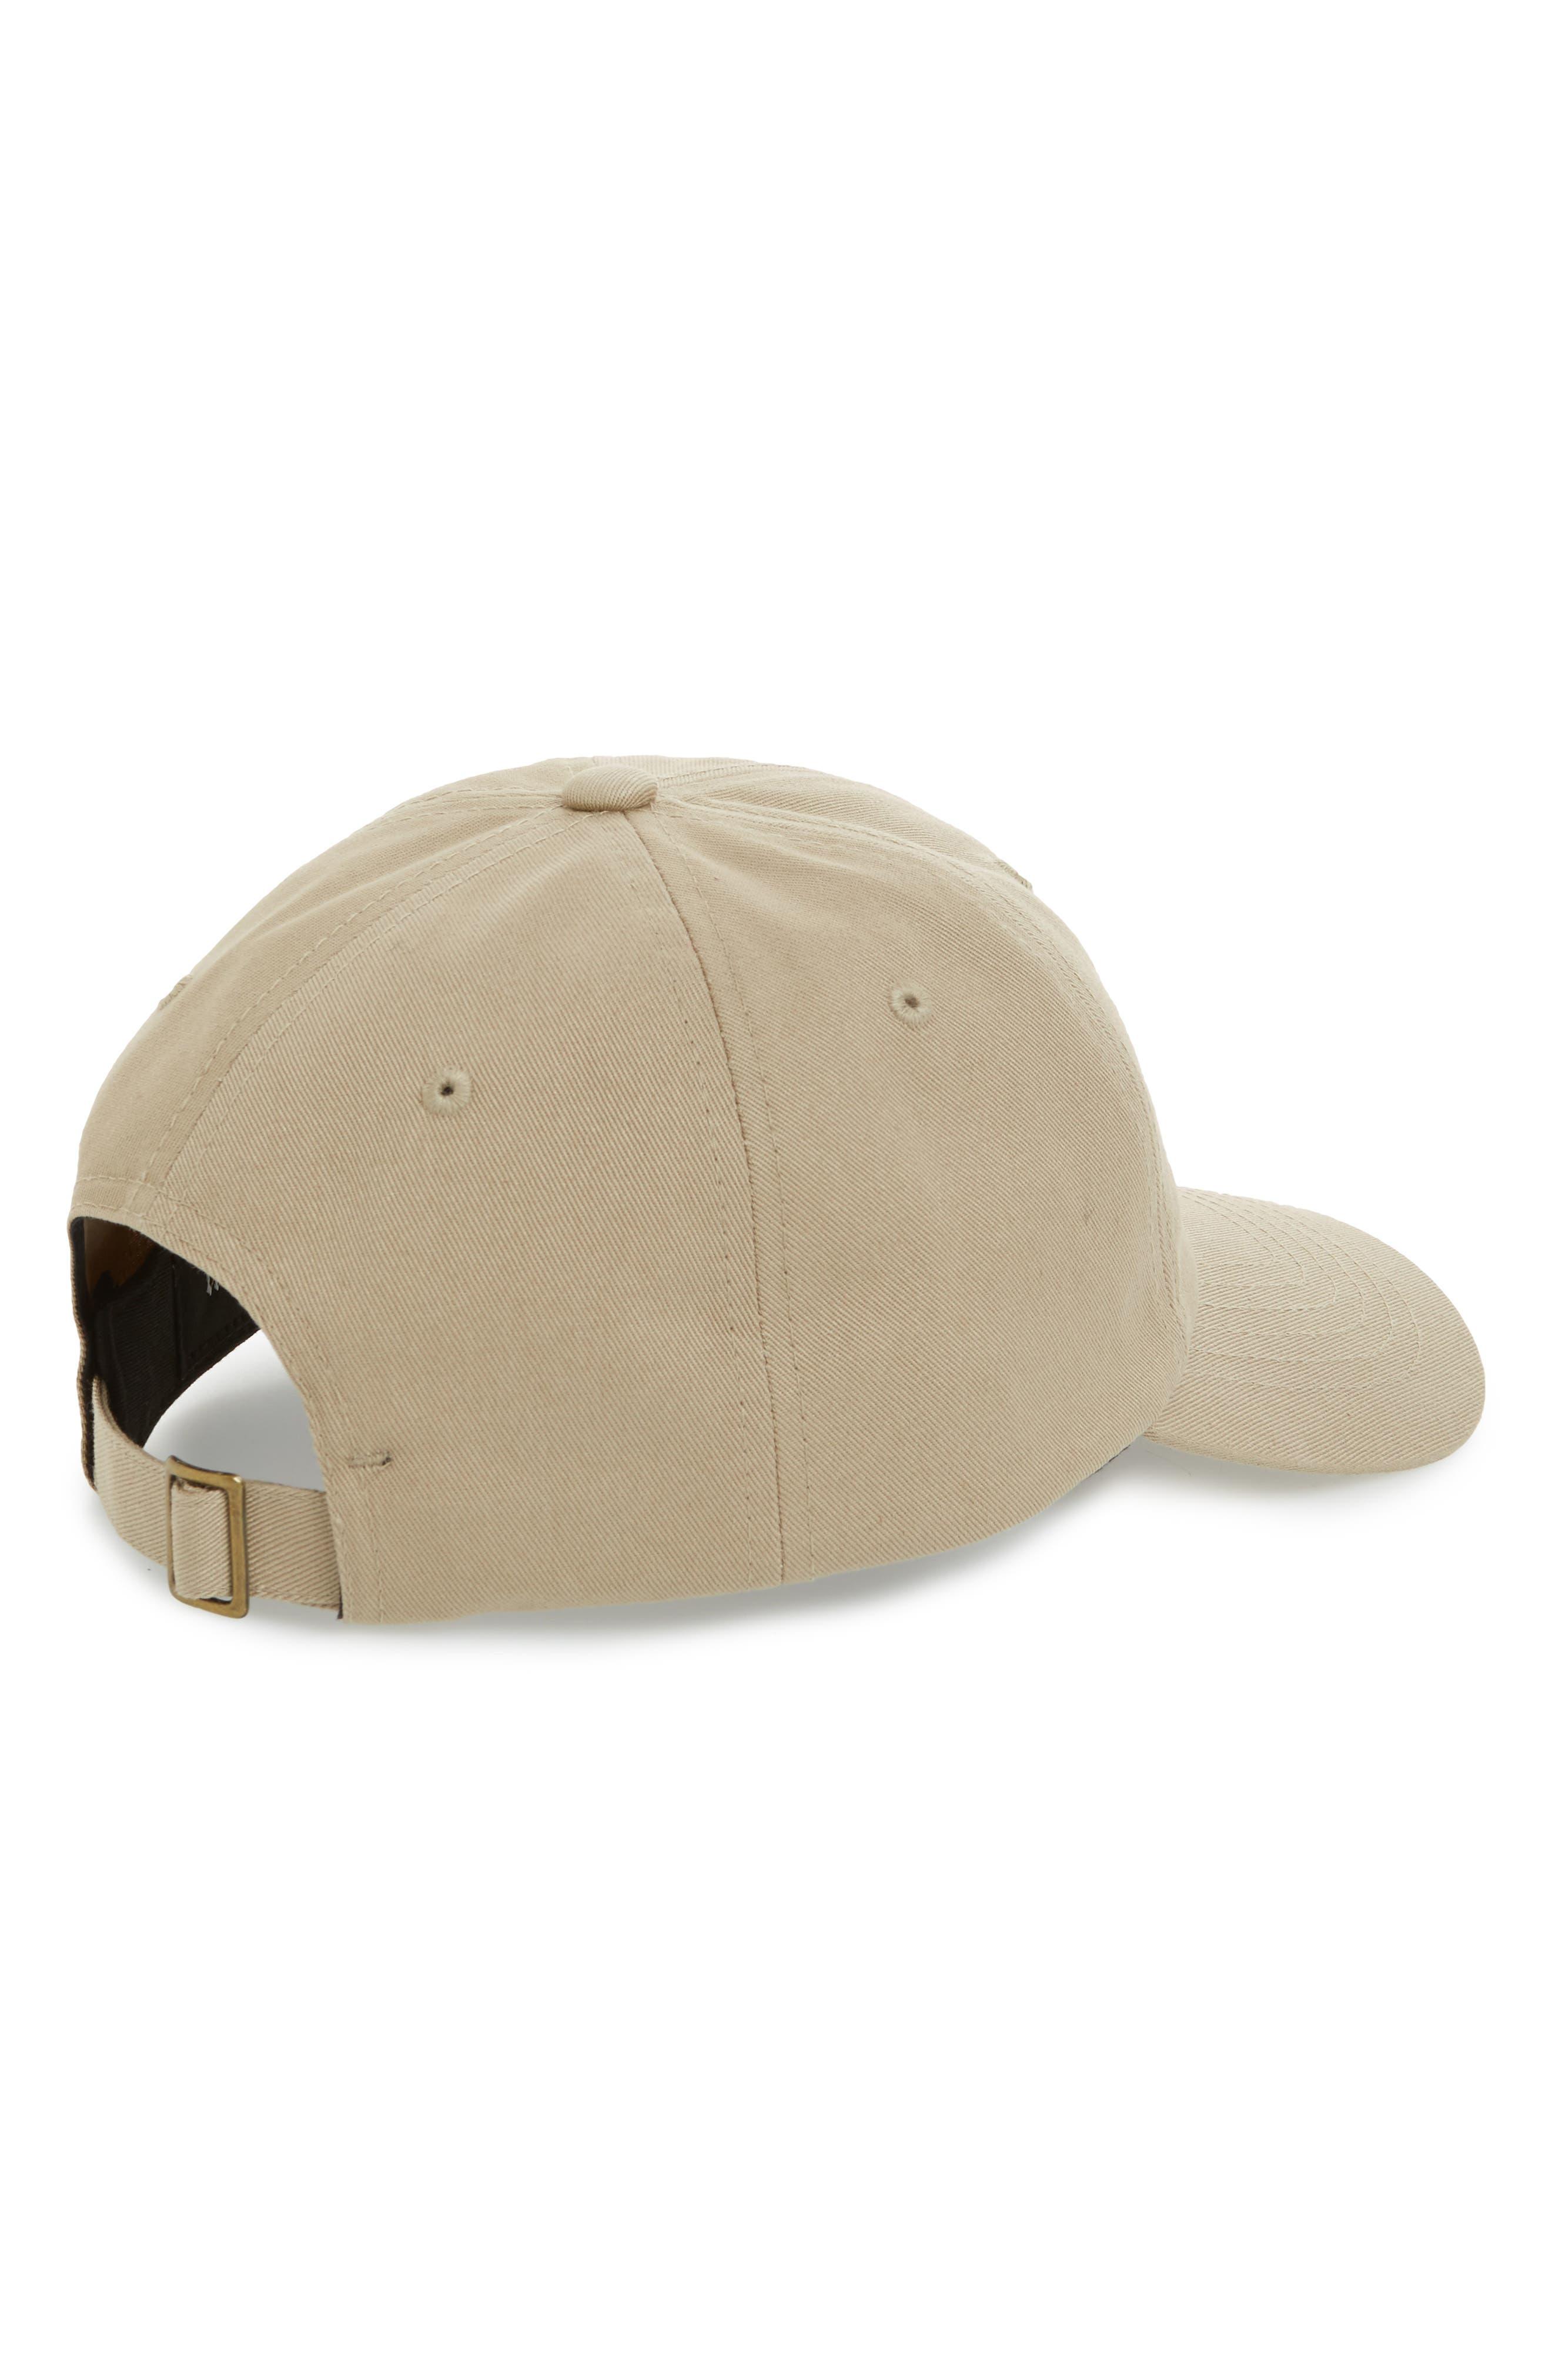 Stith Baseball Cap,                             Alternate thumbnail 4, color,